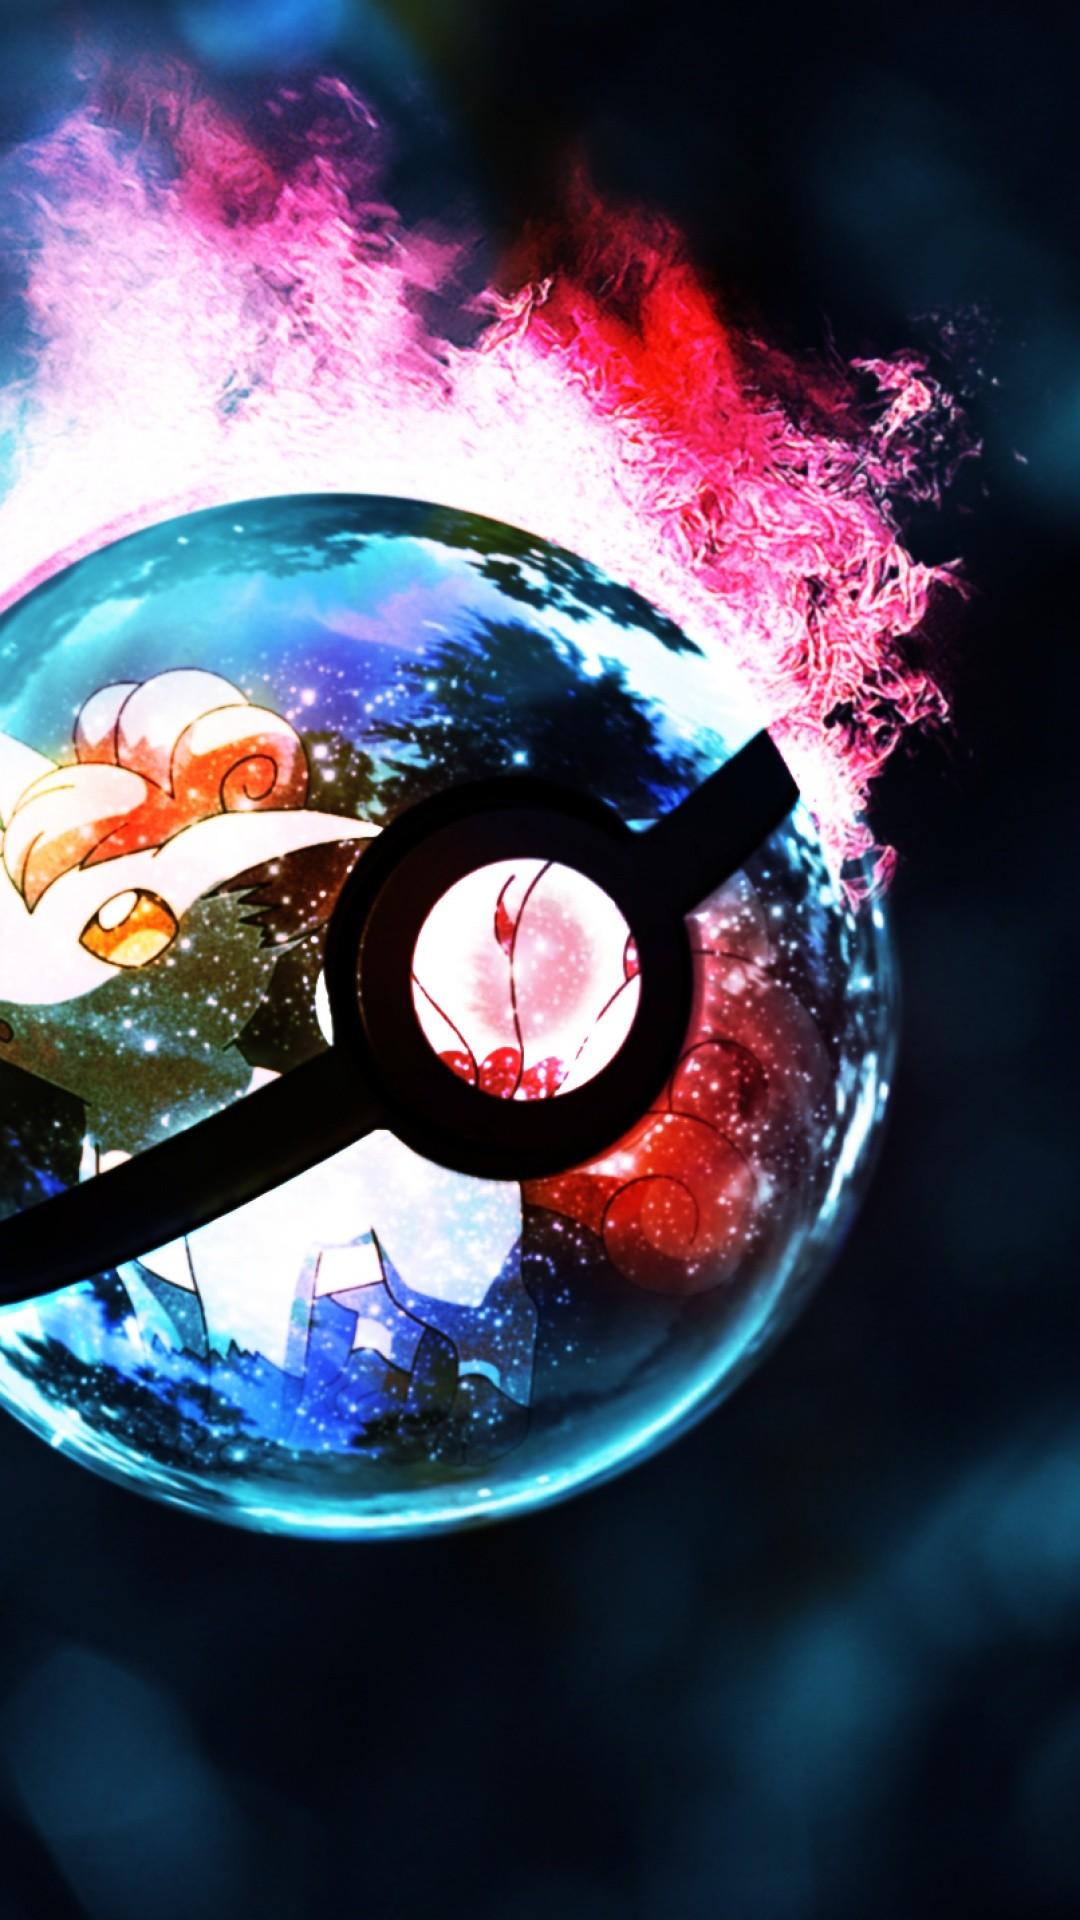 cool-pokemon-go-mobile-wallpapers-pokeball-fire-hd-